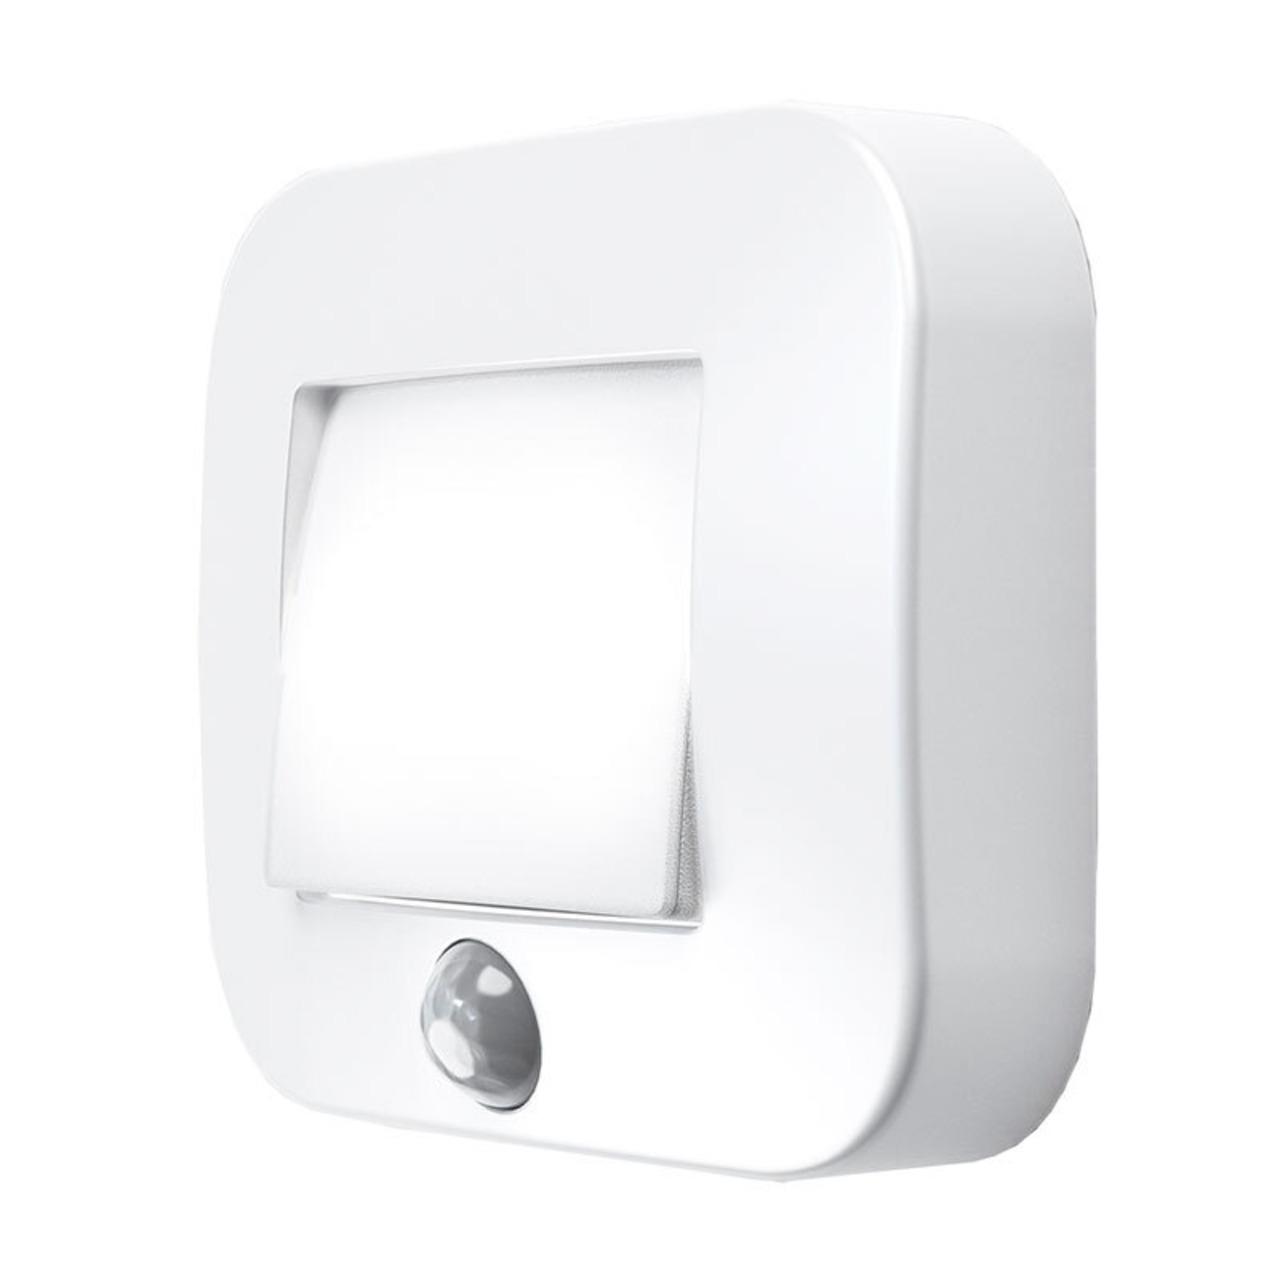 Ledvance Batterie-LED-Leuchte Nightlux Hall- mit PIR-Bewegungsmelder- weiss